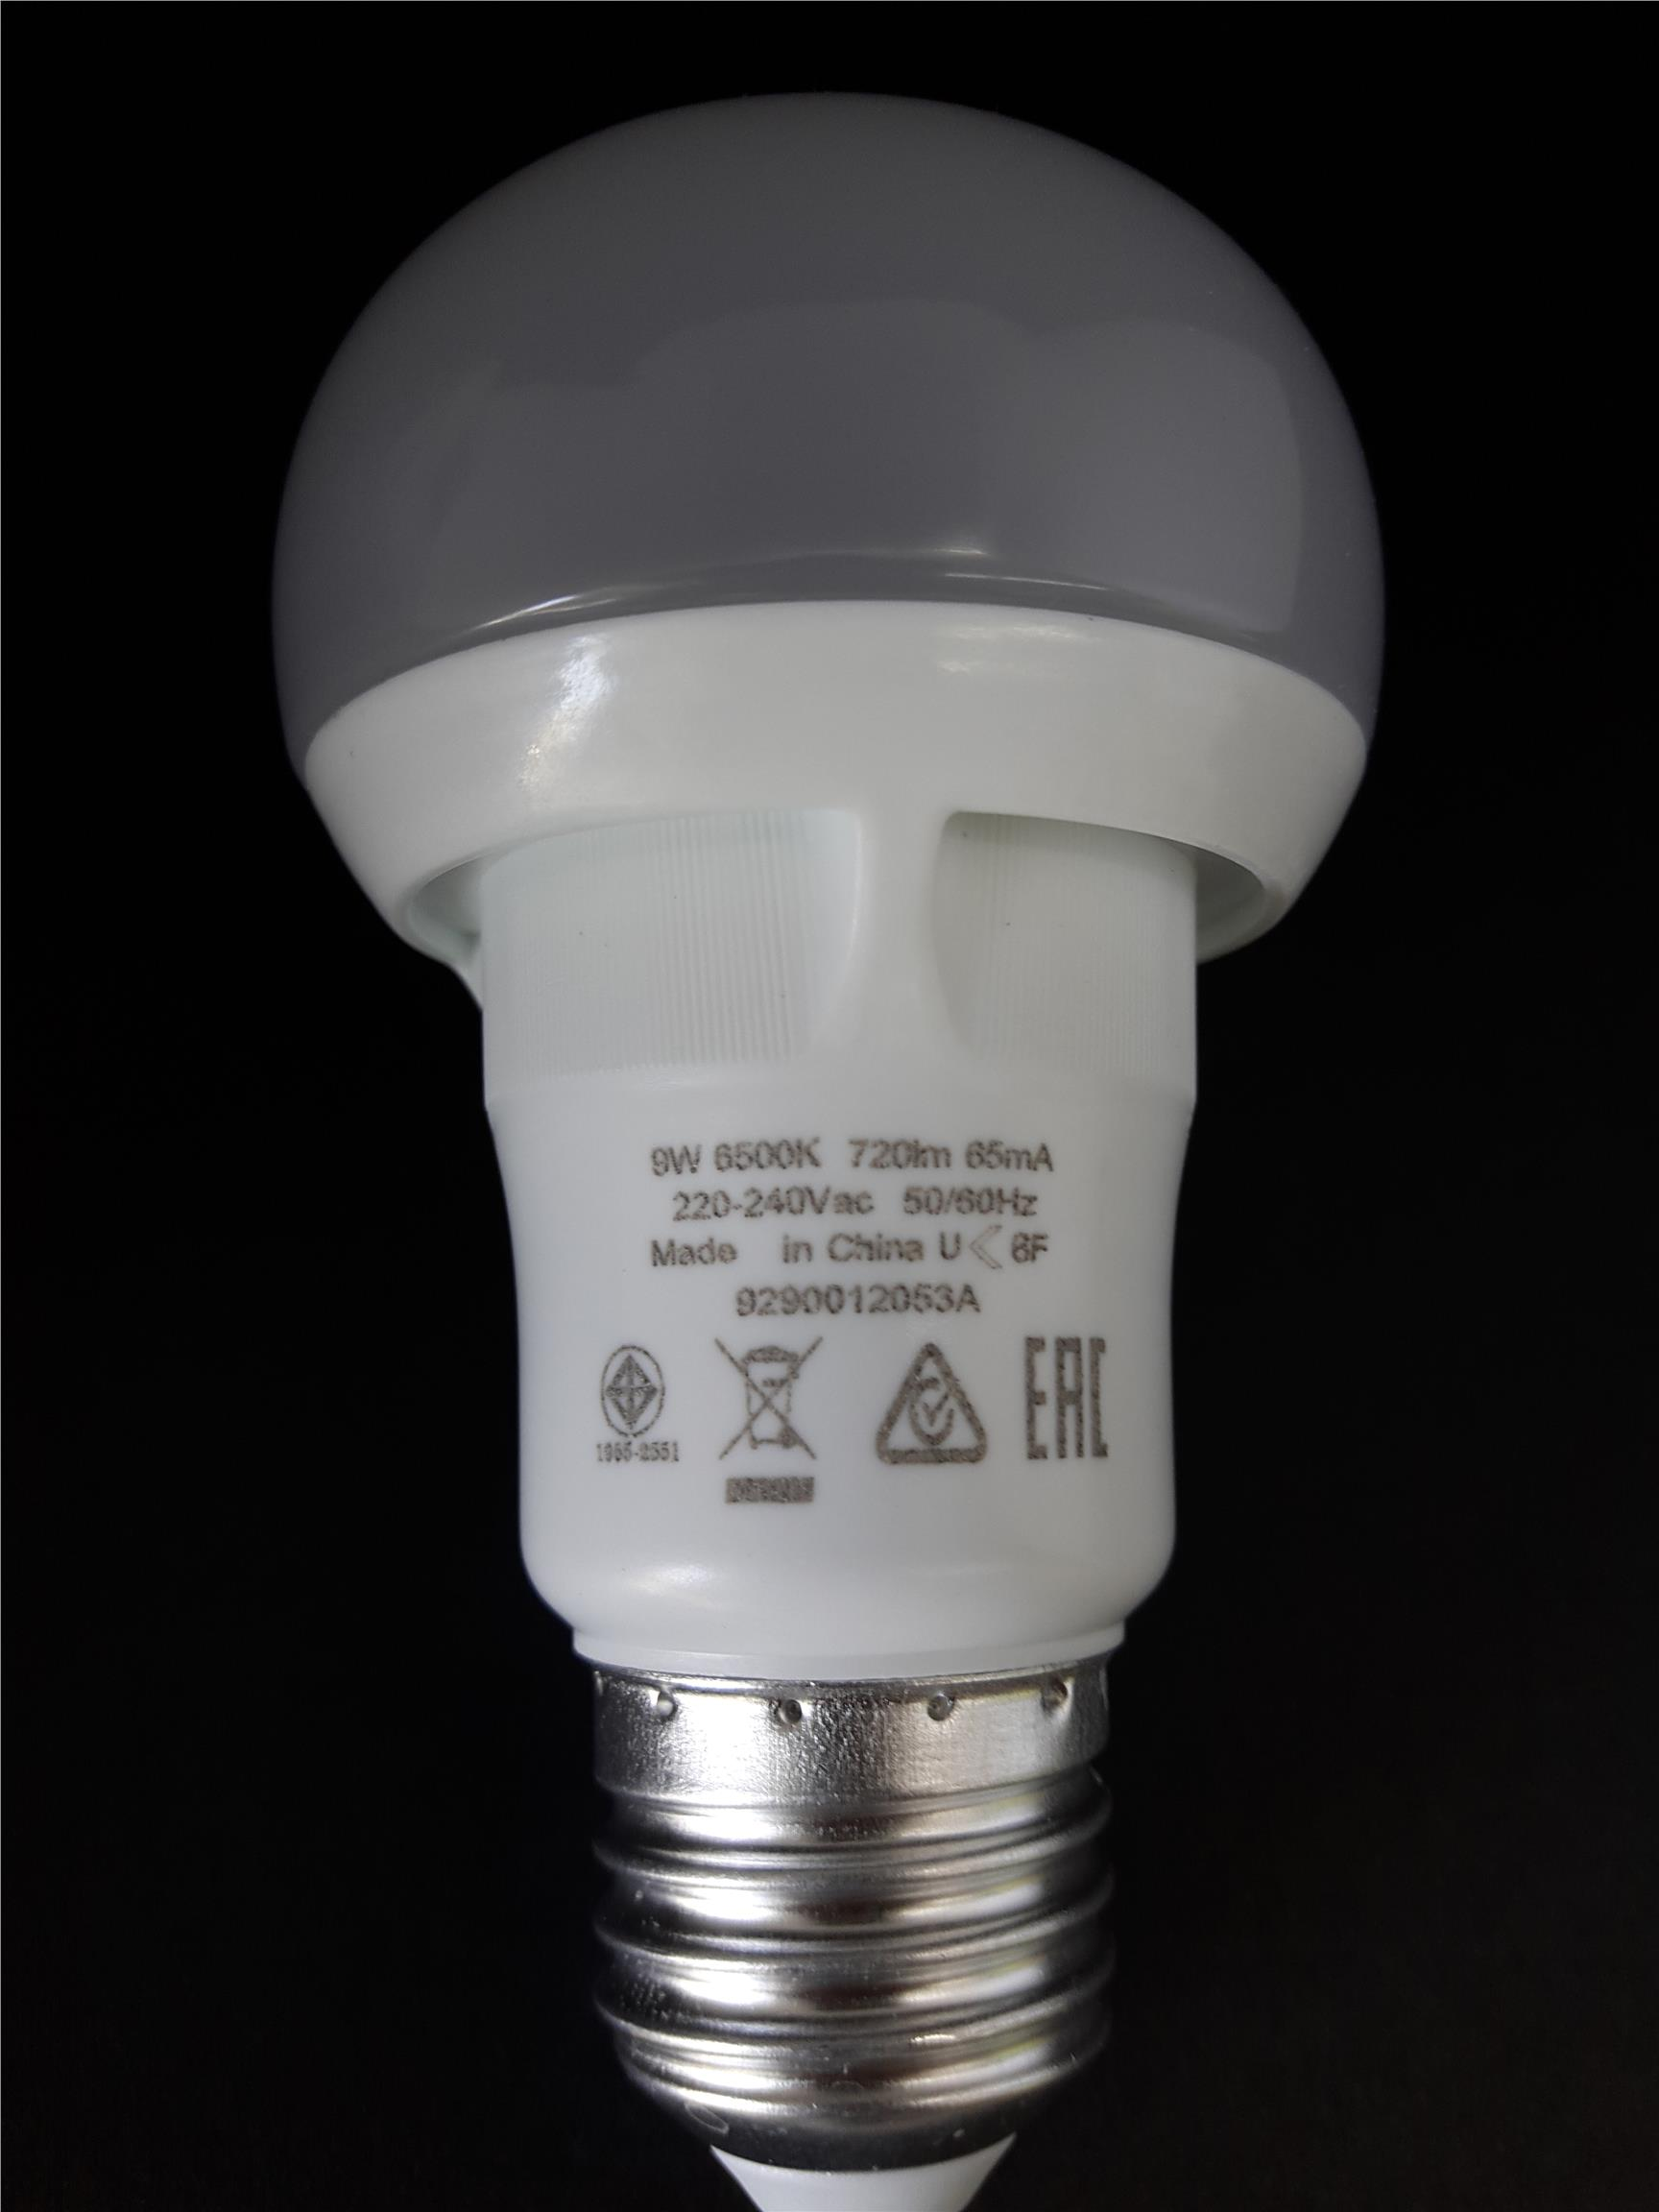 philips-9w-essential-led-bulb-e27-6500k-daylight-hnlmarketing-1703-12-chewannhin@6 Faszinierend Led E27 12 Watt Dekorationen